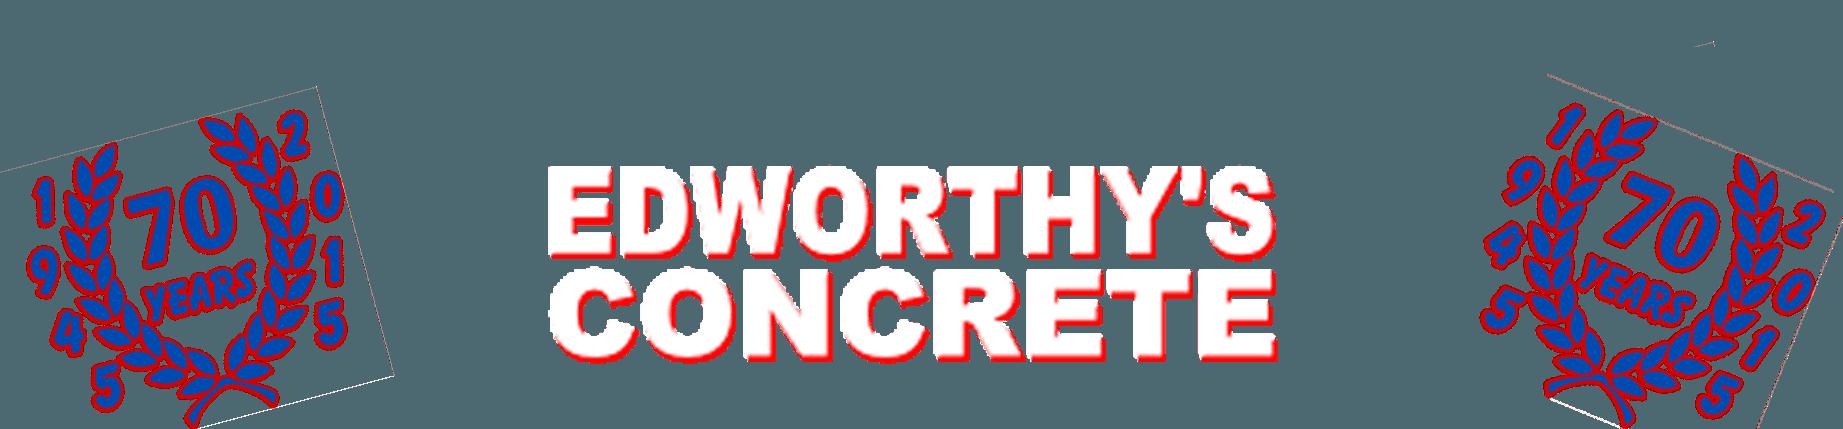 R.W.T Edworthy & Son - 70 Years of Devon COncrete - Edworthy's Concrete